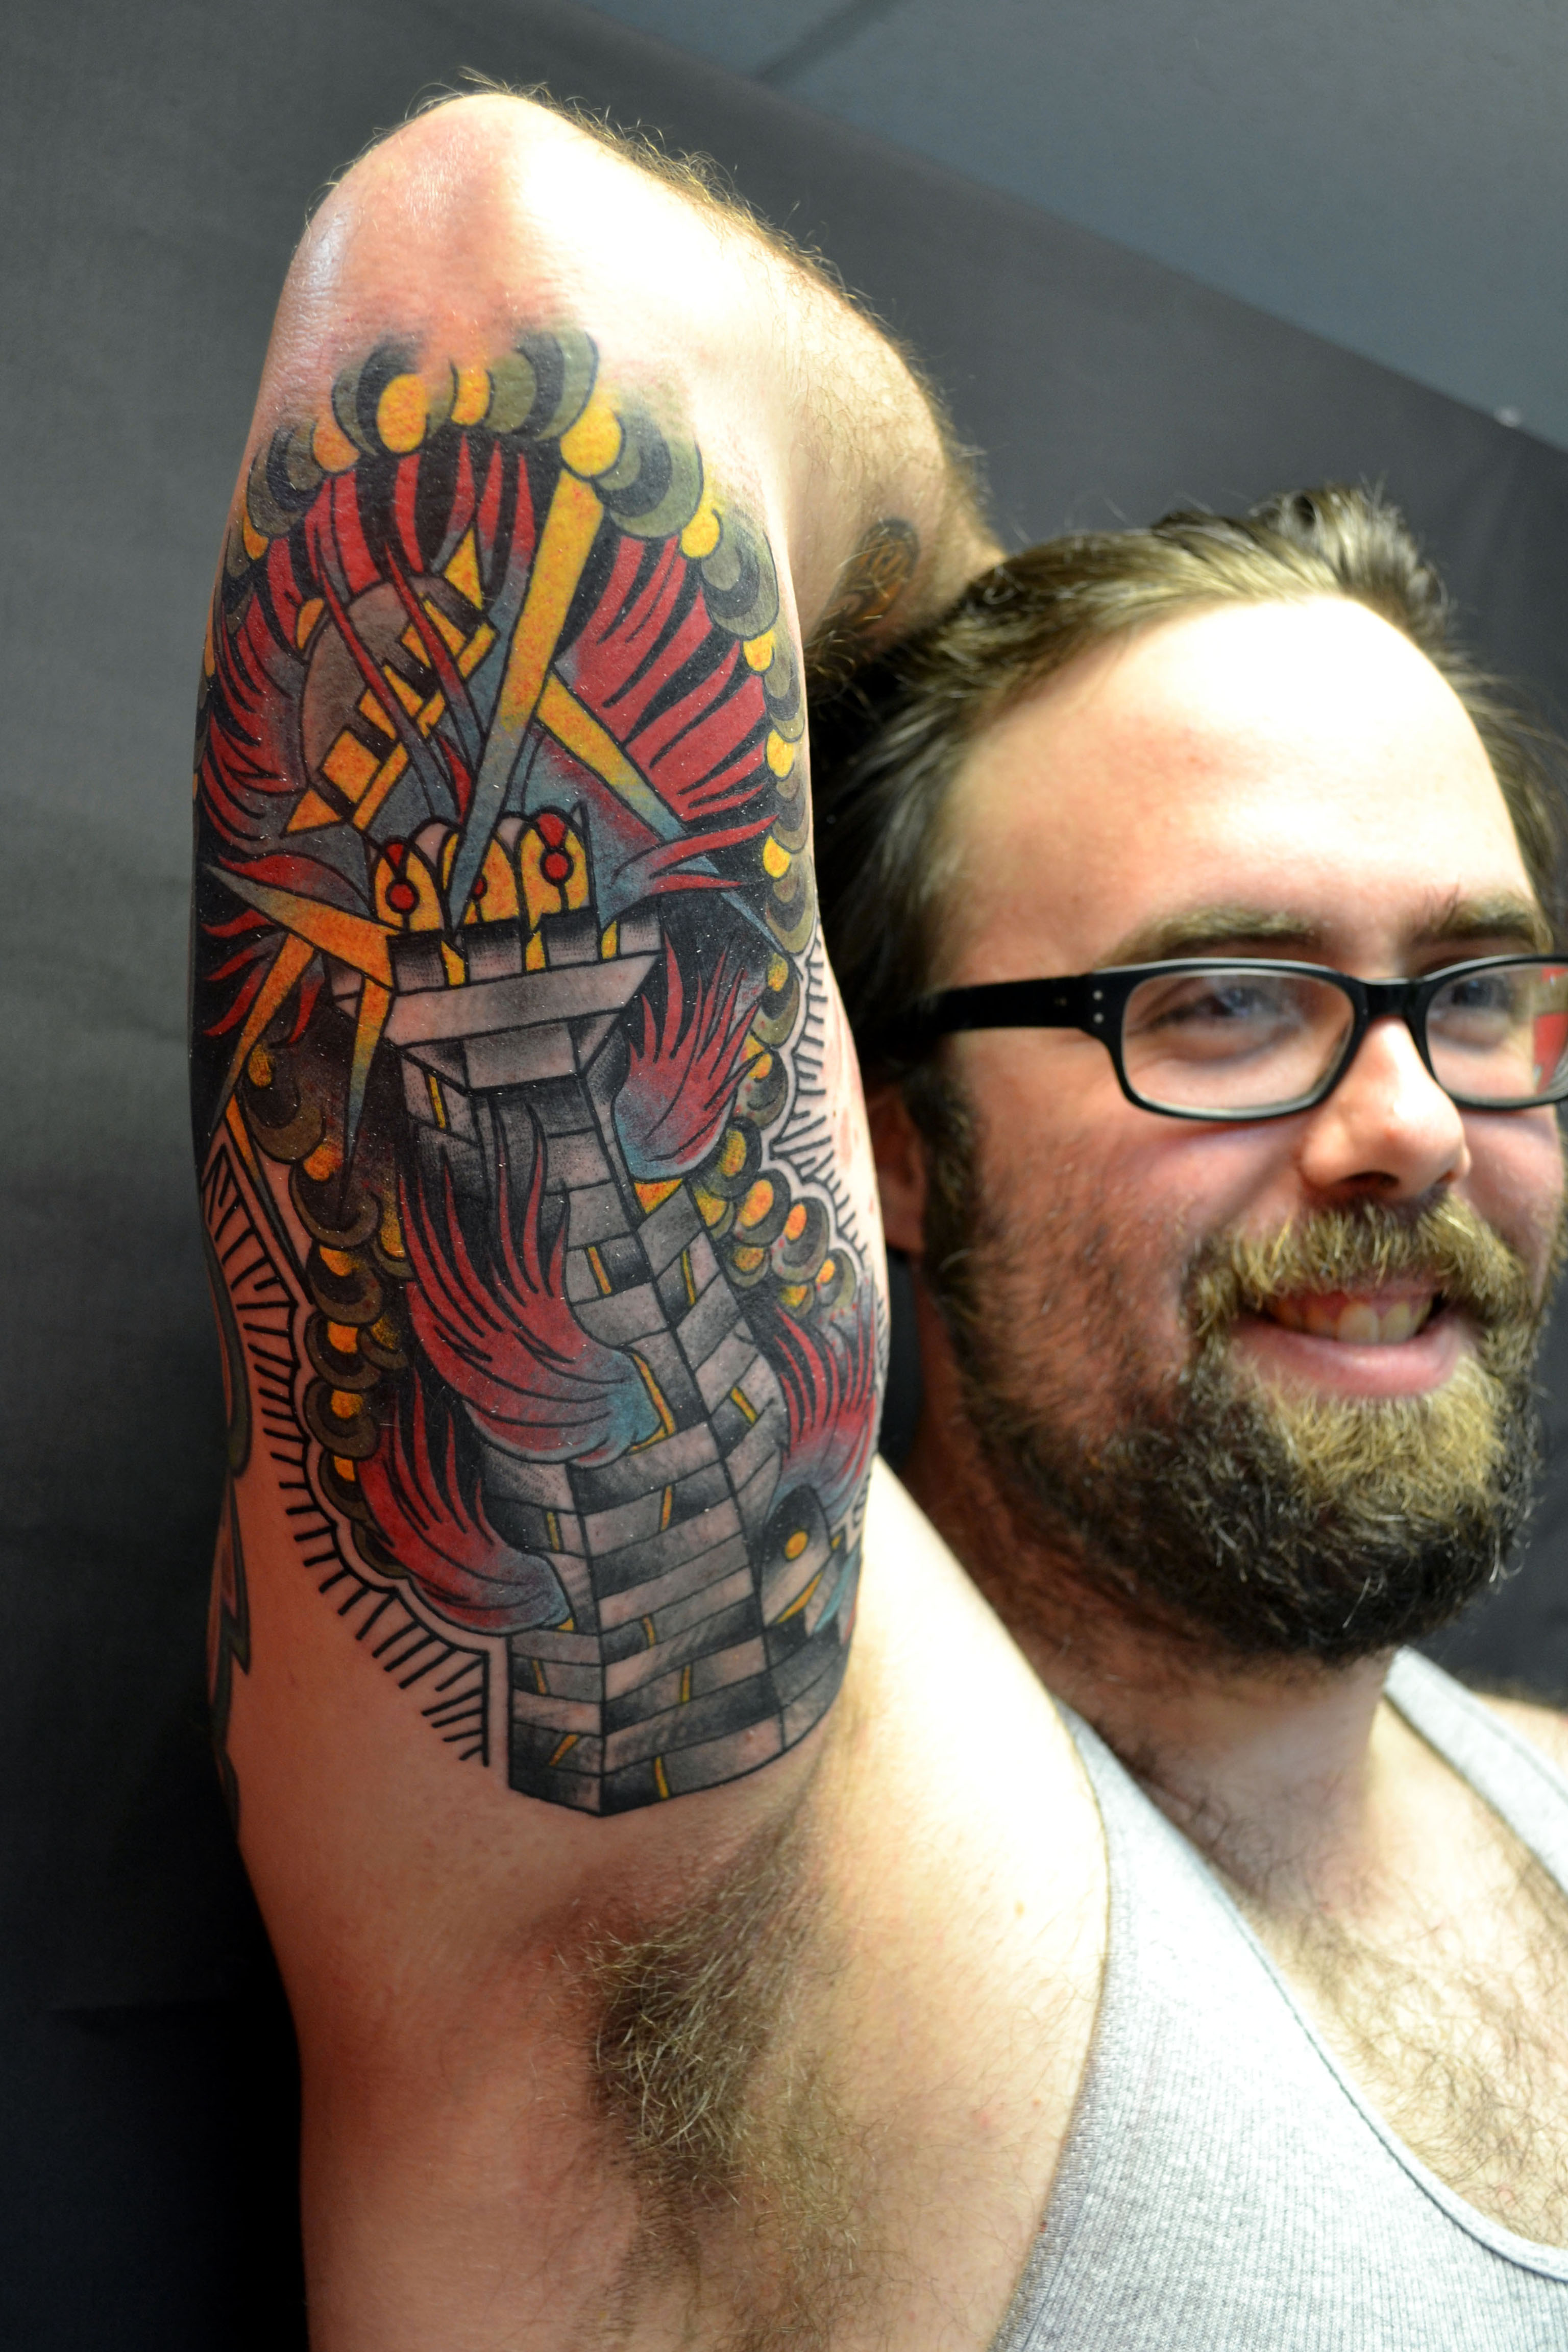 Lighthouse Tattoo   RAYMOND WALLACE TATTOOING: flawlesswallace.com/tattoos/tower-tattoo-done-2